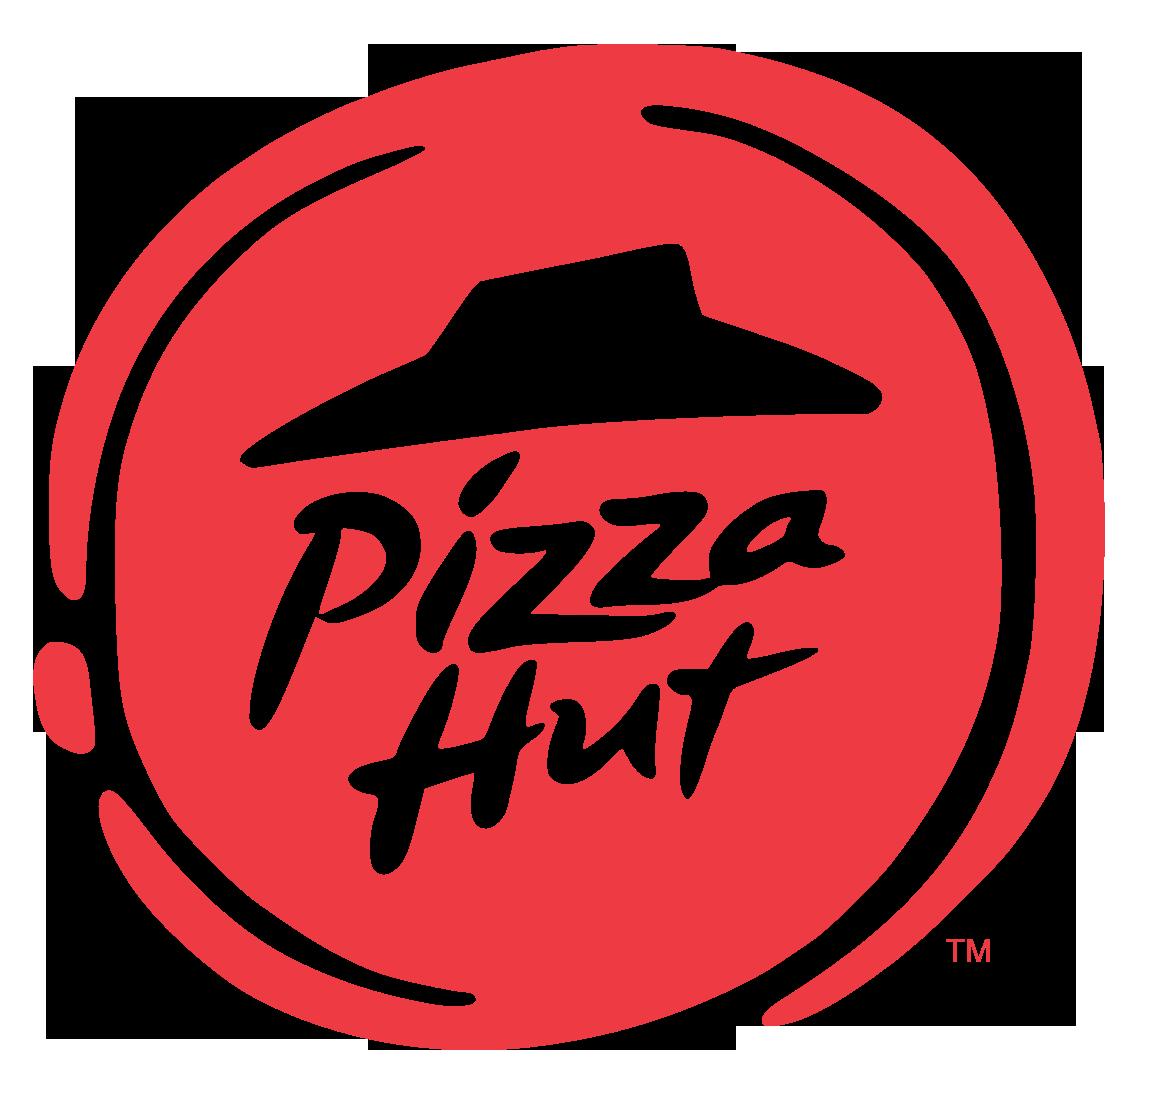 Pizza-Hut-Logo-PNG-Transparent-Background.png